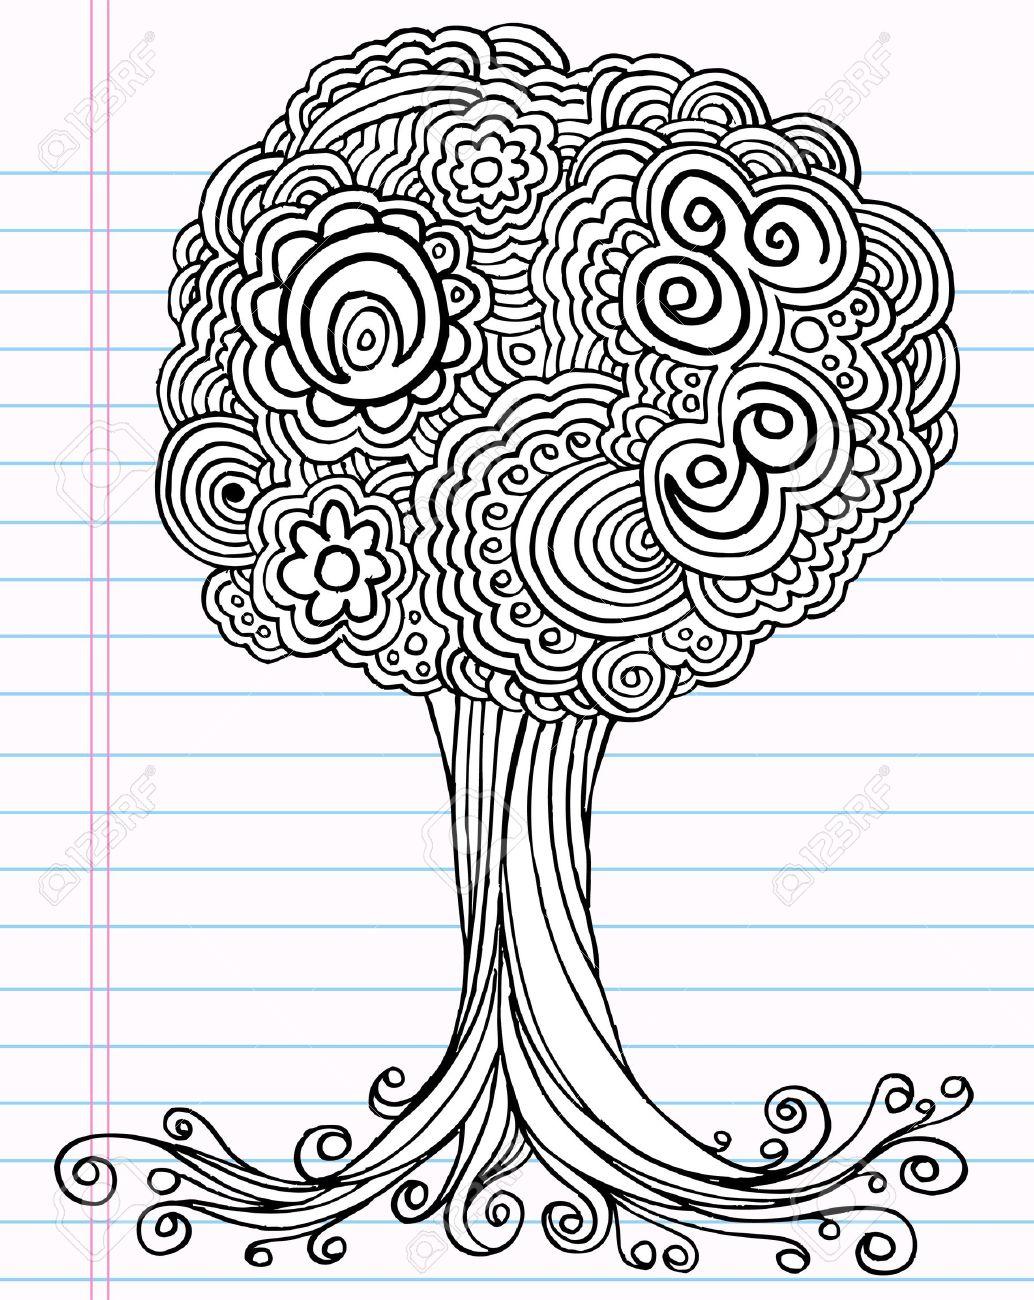 1034x1300 Notebook Doodle Sketch Henna Tree Drawing Illustration Art Royalty